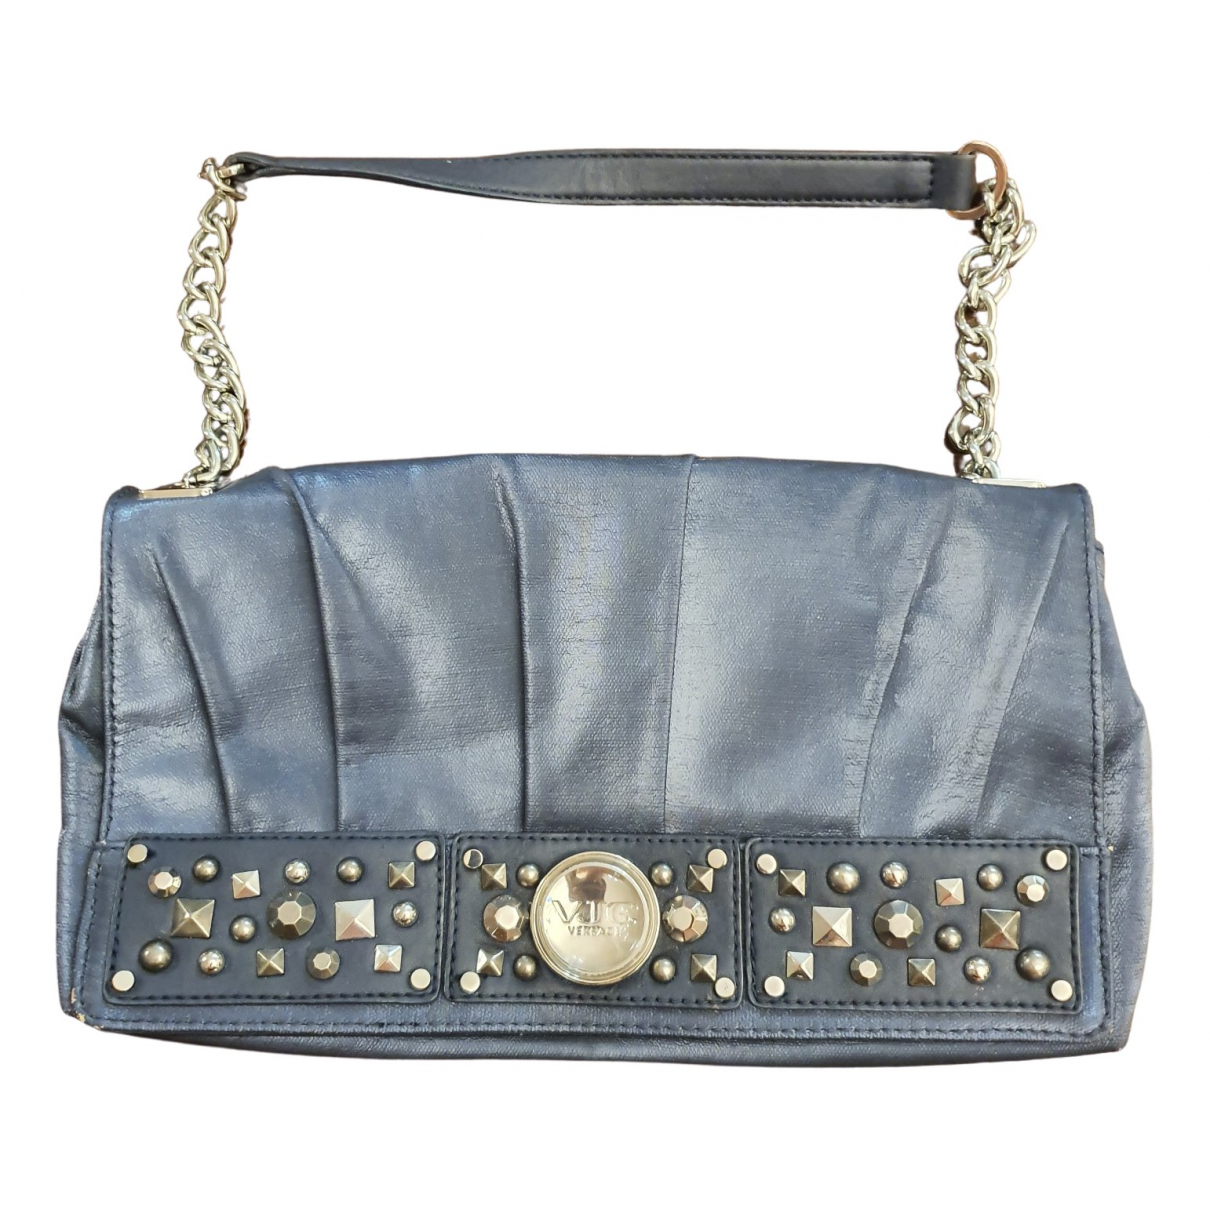 Versace Jeans \N Blue Velvet Clutch bag for Women \N